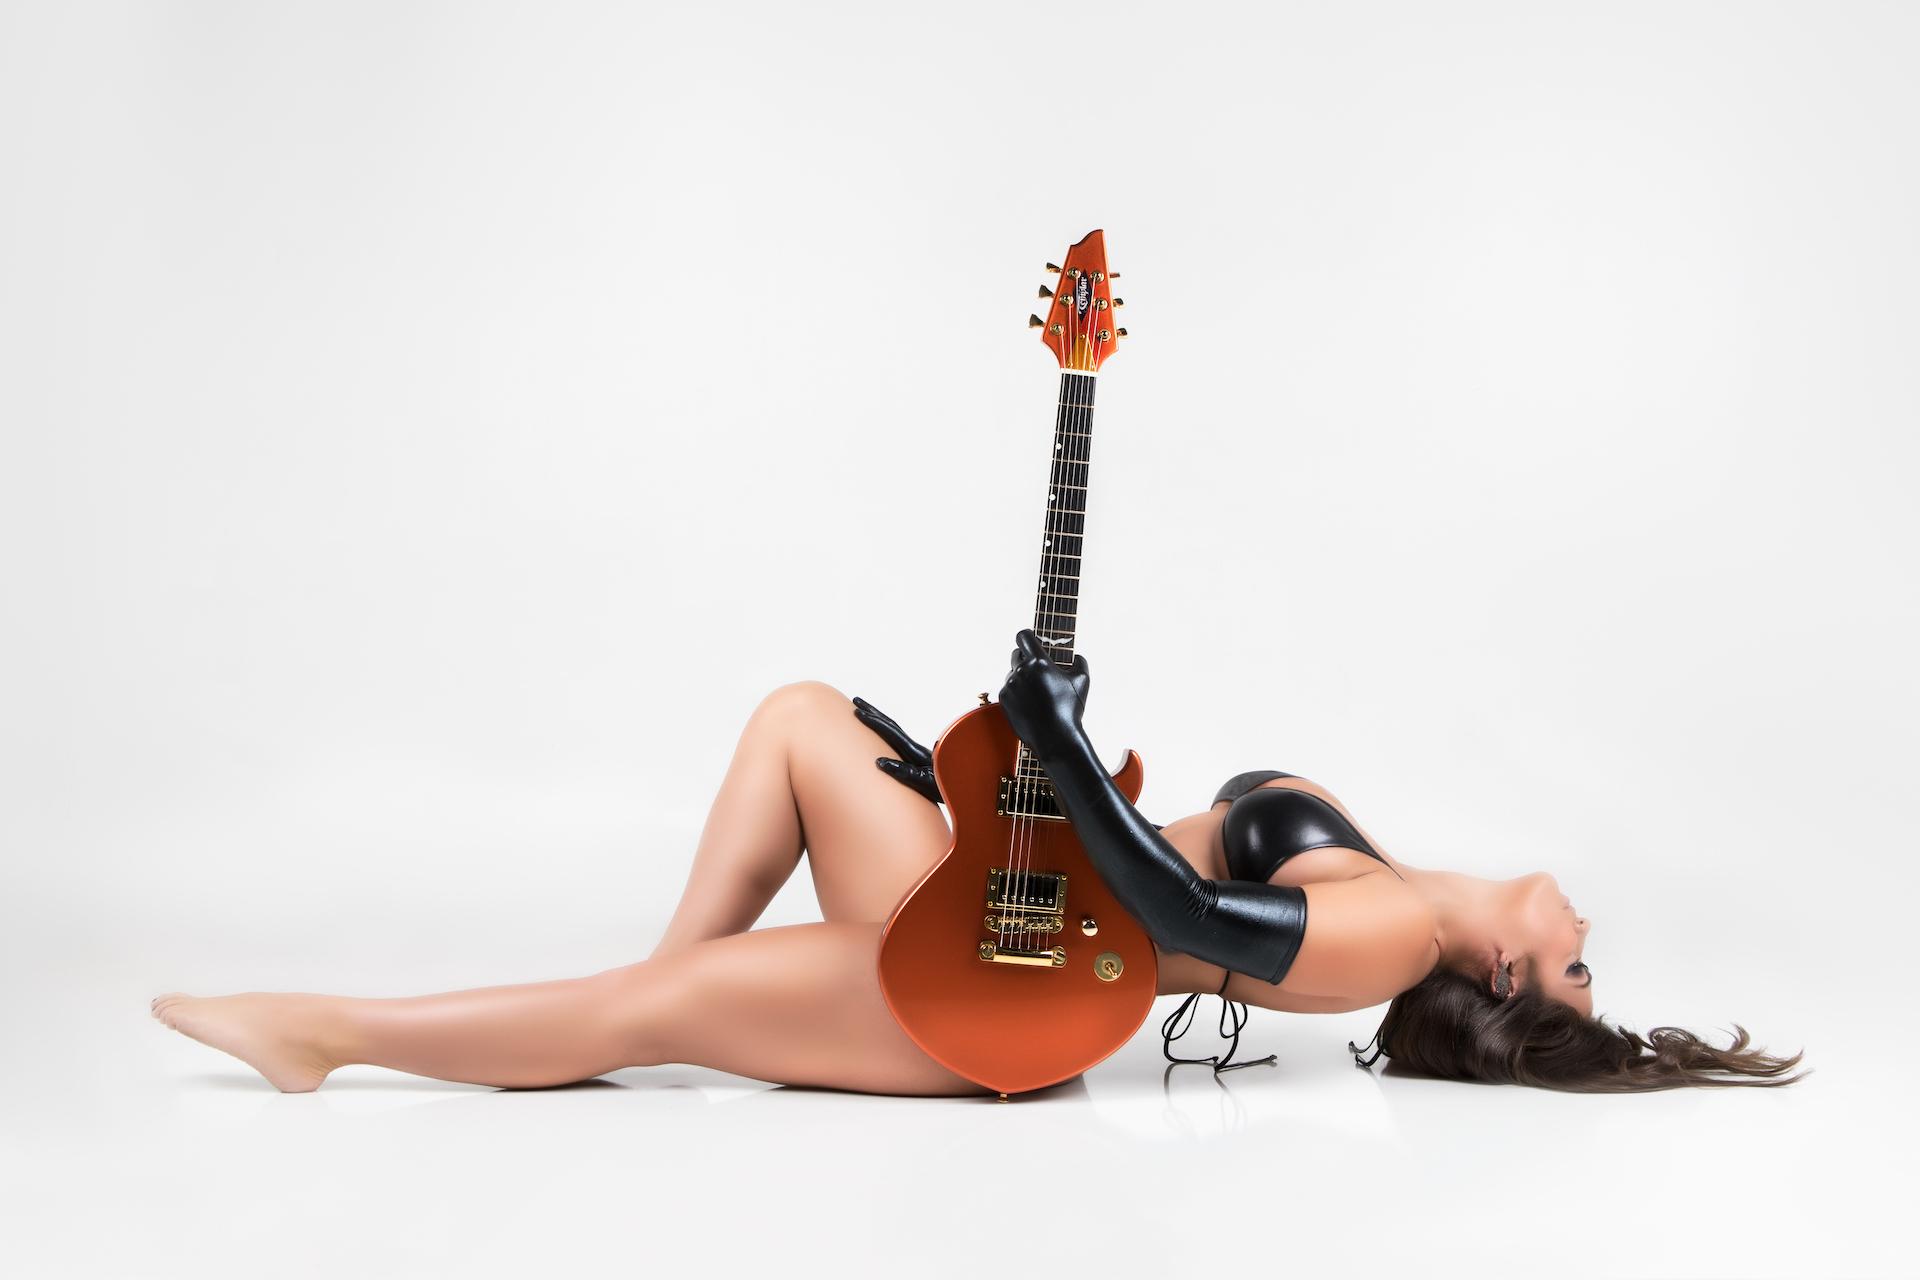 Guitar1017Courtney - IMGL9284-Edit.jpg